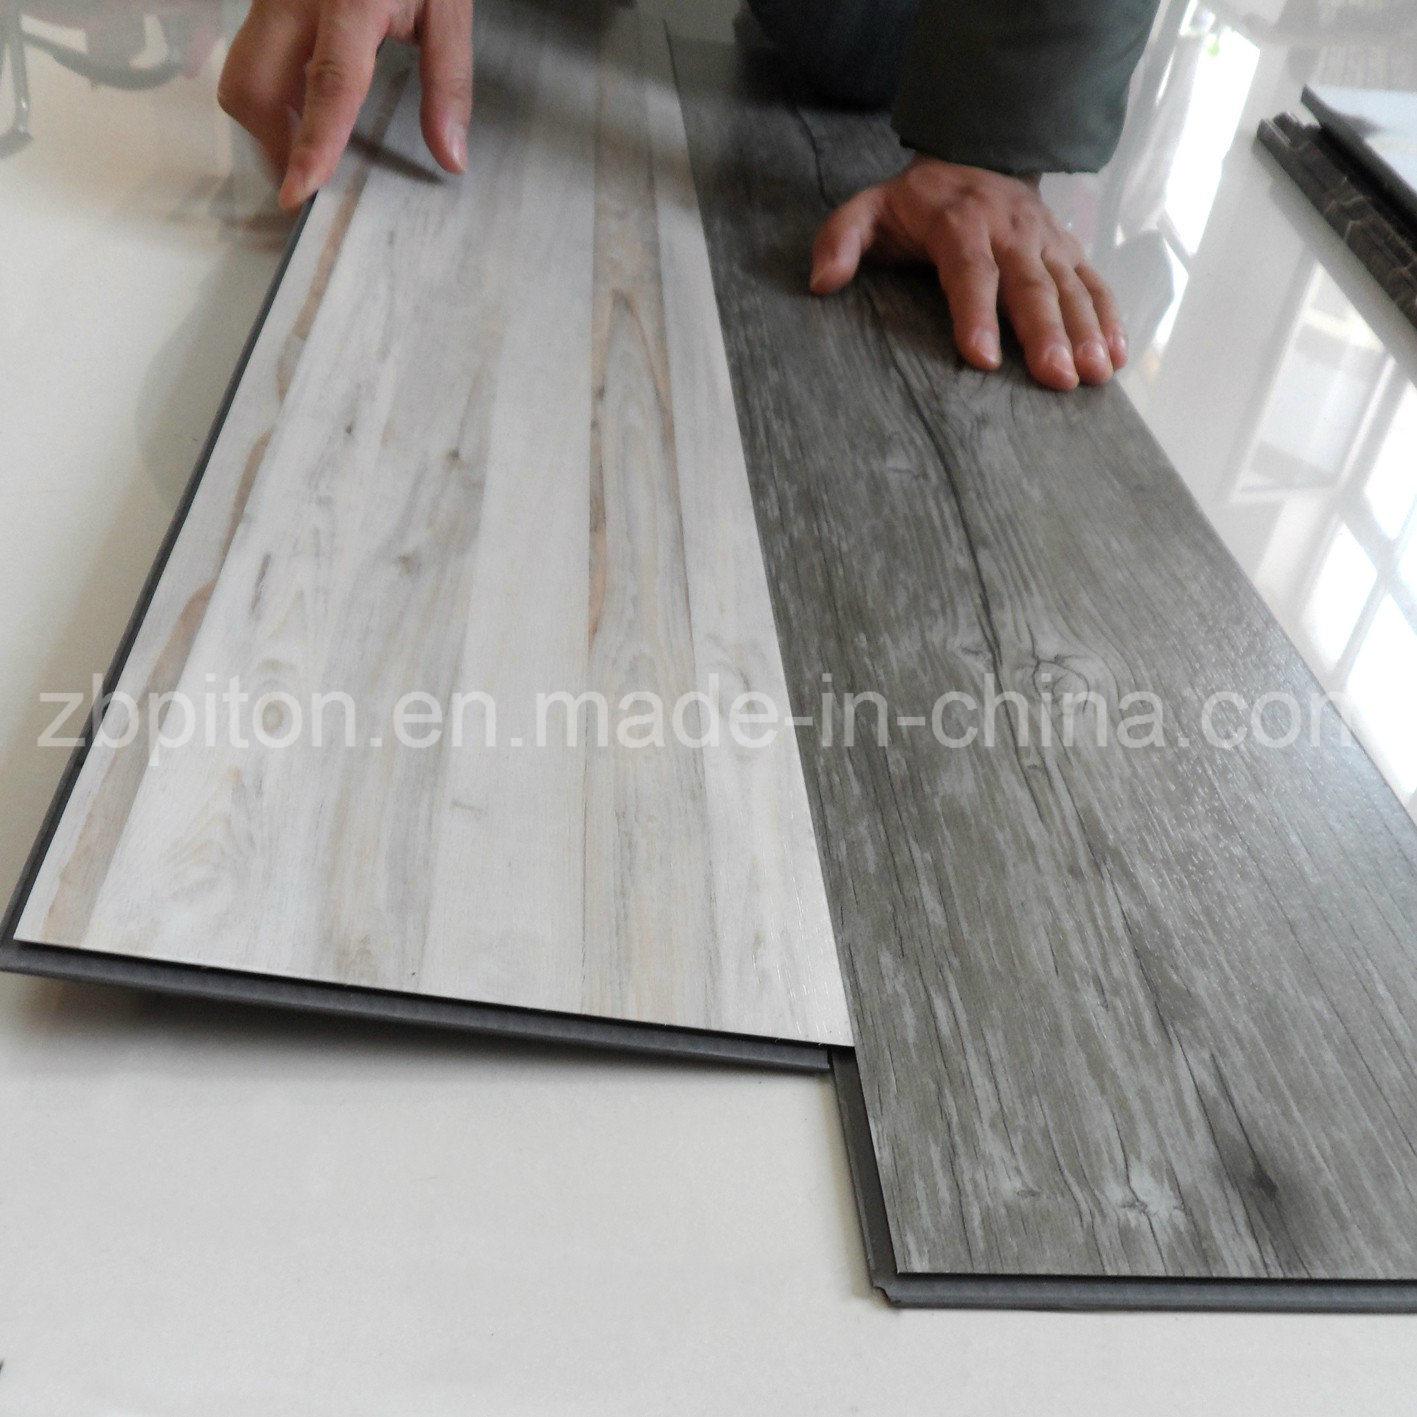 China Lvt Luxury Vinyl Tile Pvc Flooring Planks China